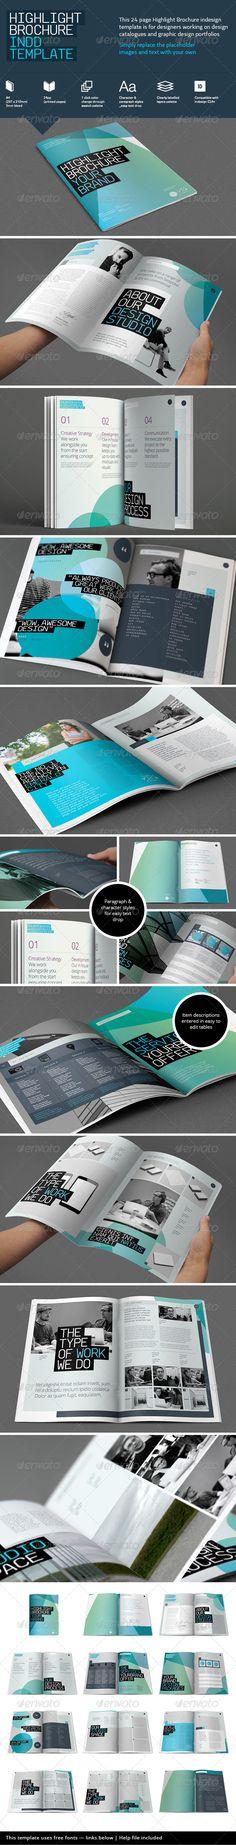 Highlight Brochure Template Brochures Print Templates Brand Book - Print brochure templates